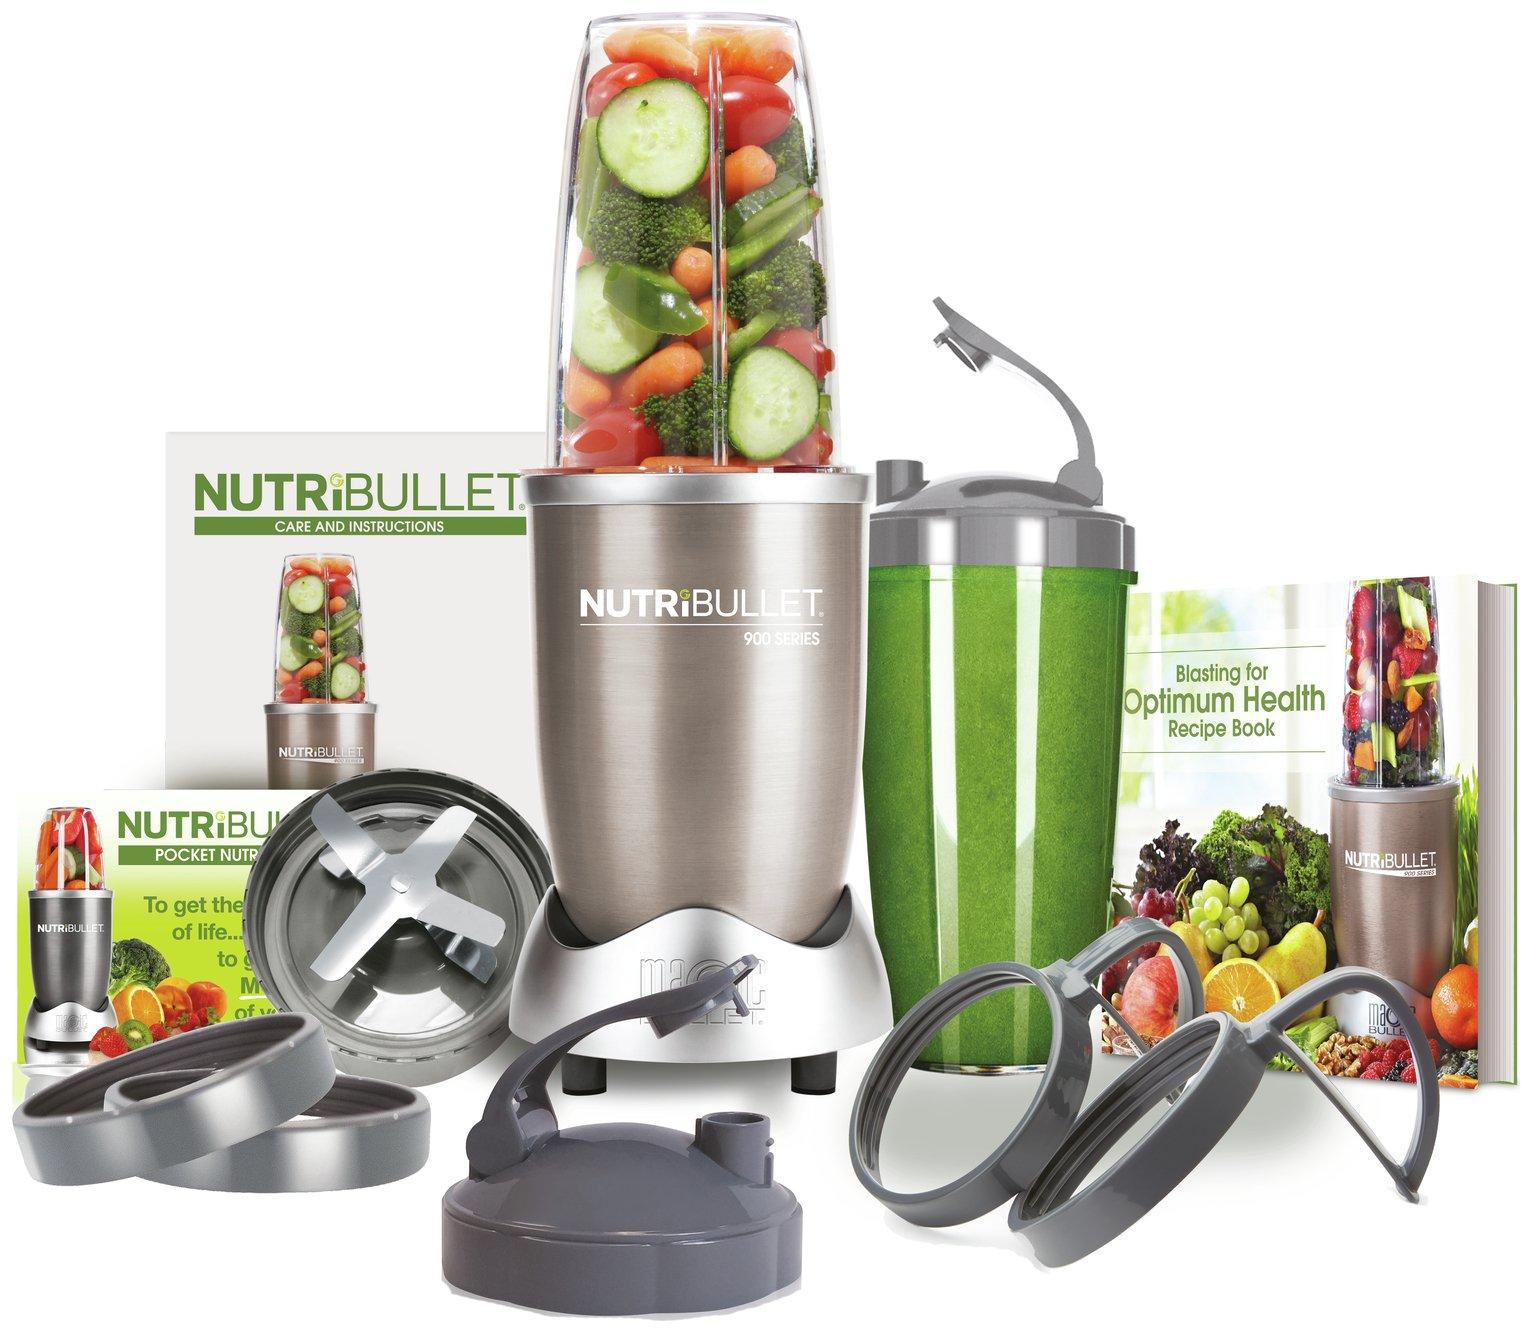 NutriBullet 13 Piece Nutritional Blender